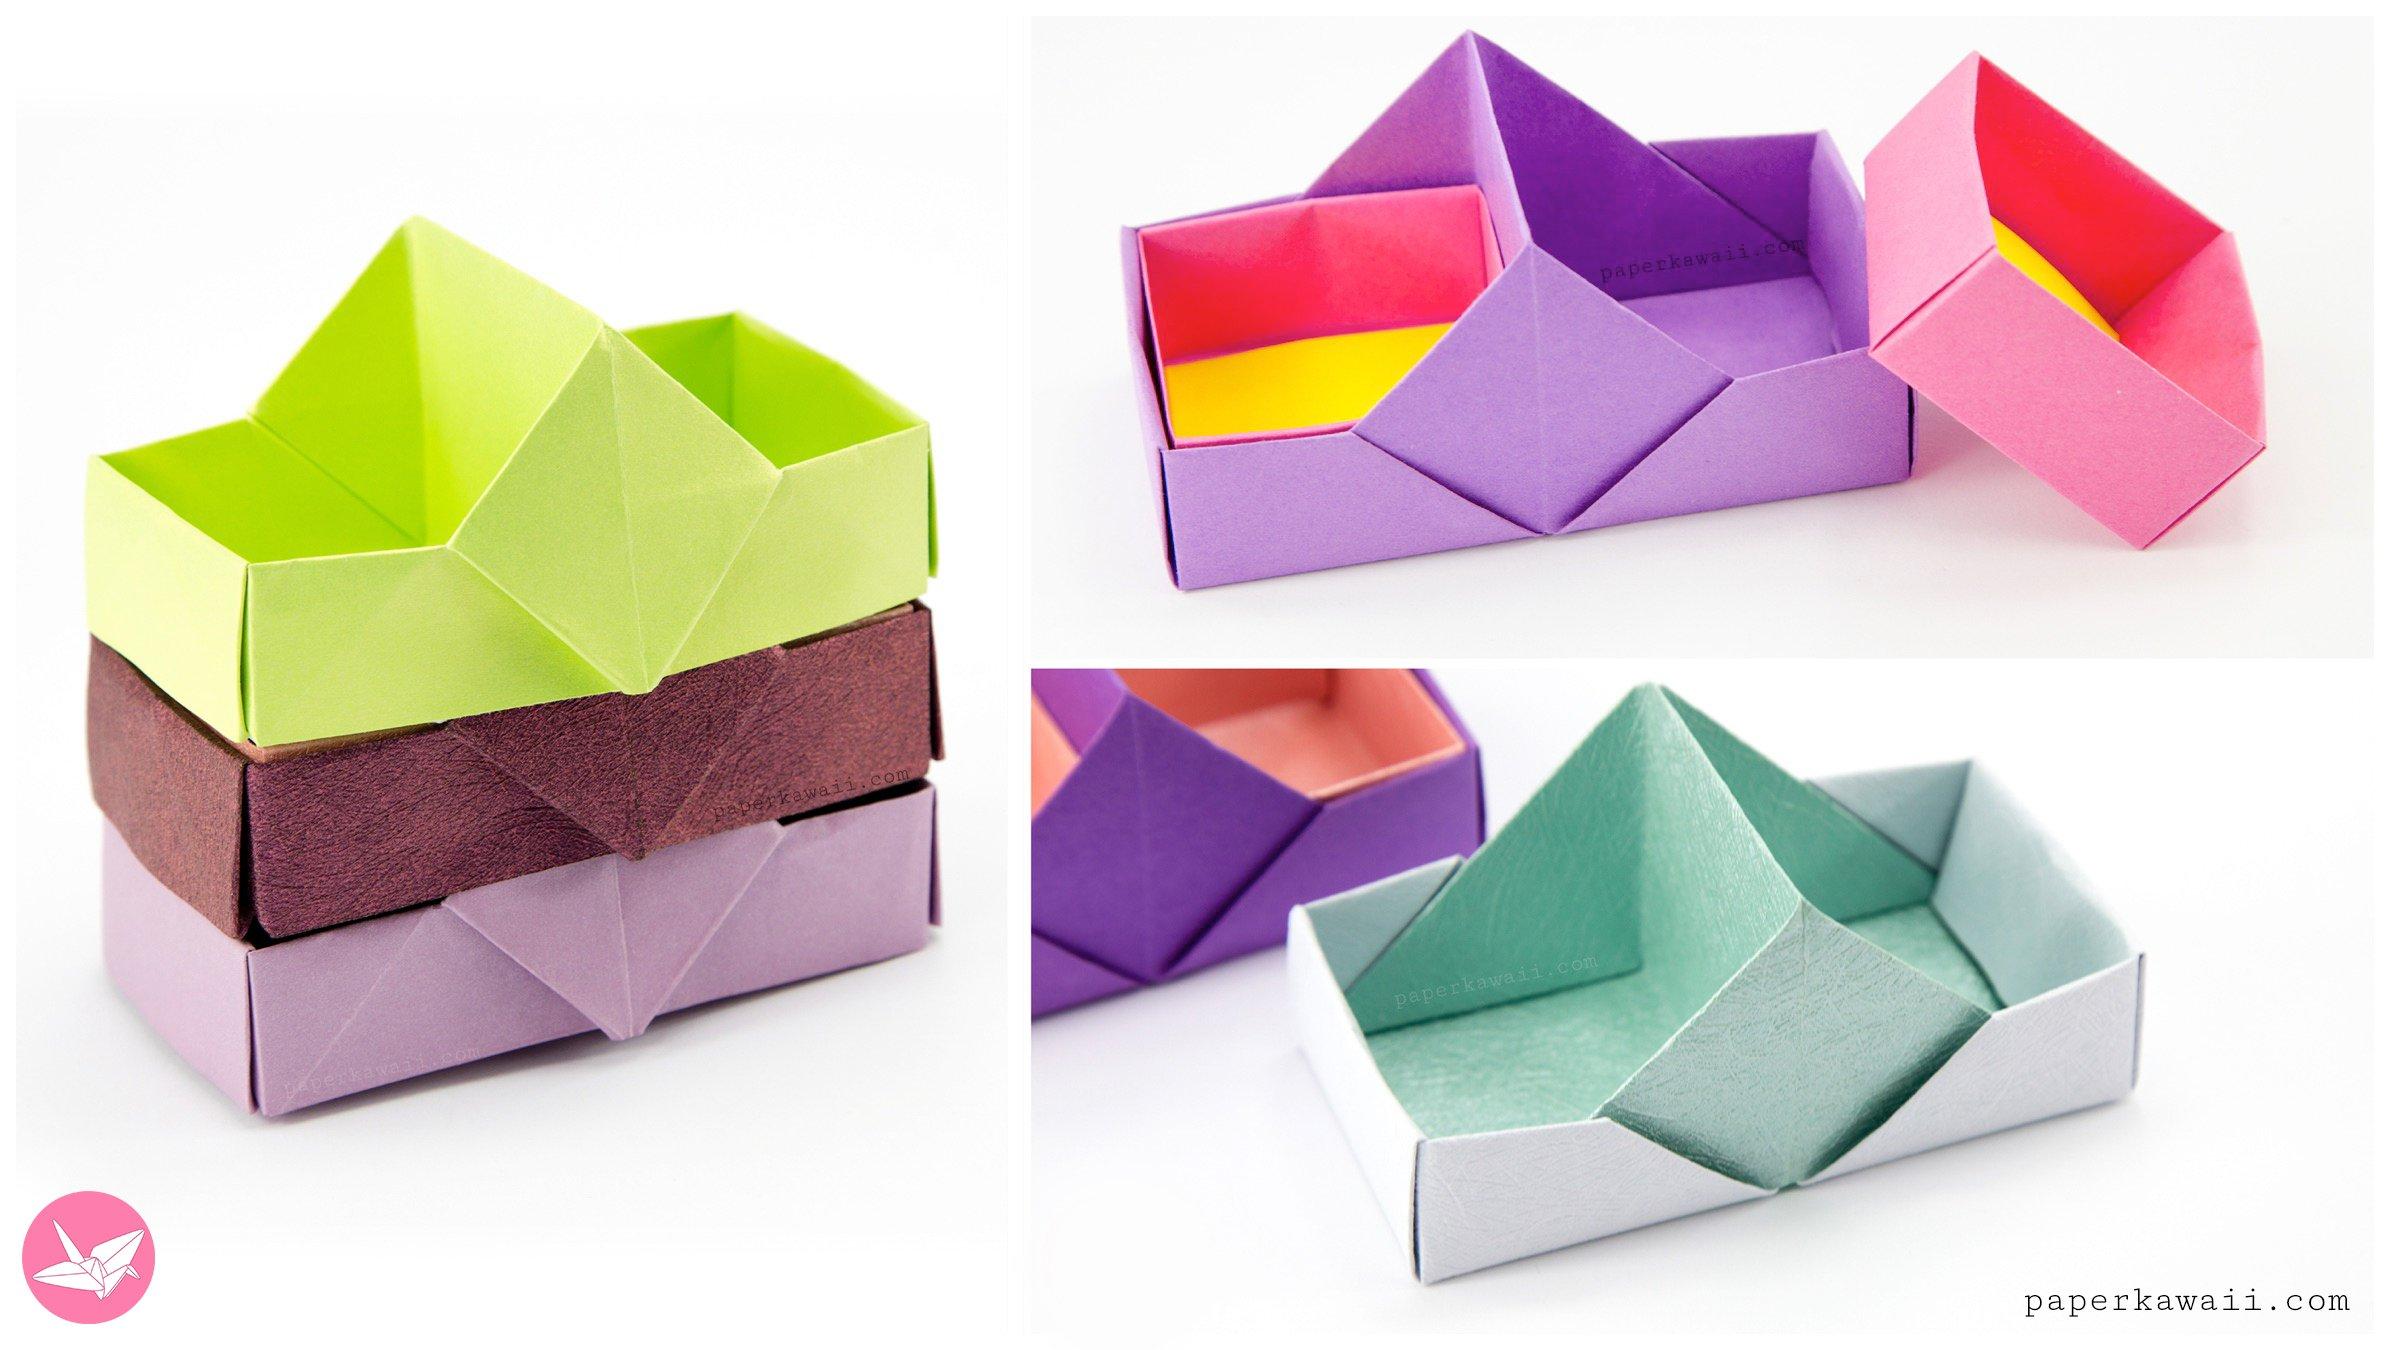 Greenpak Recyclable 4 Kraft Take Out Food Box 85 X 625 35 Origami